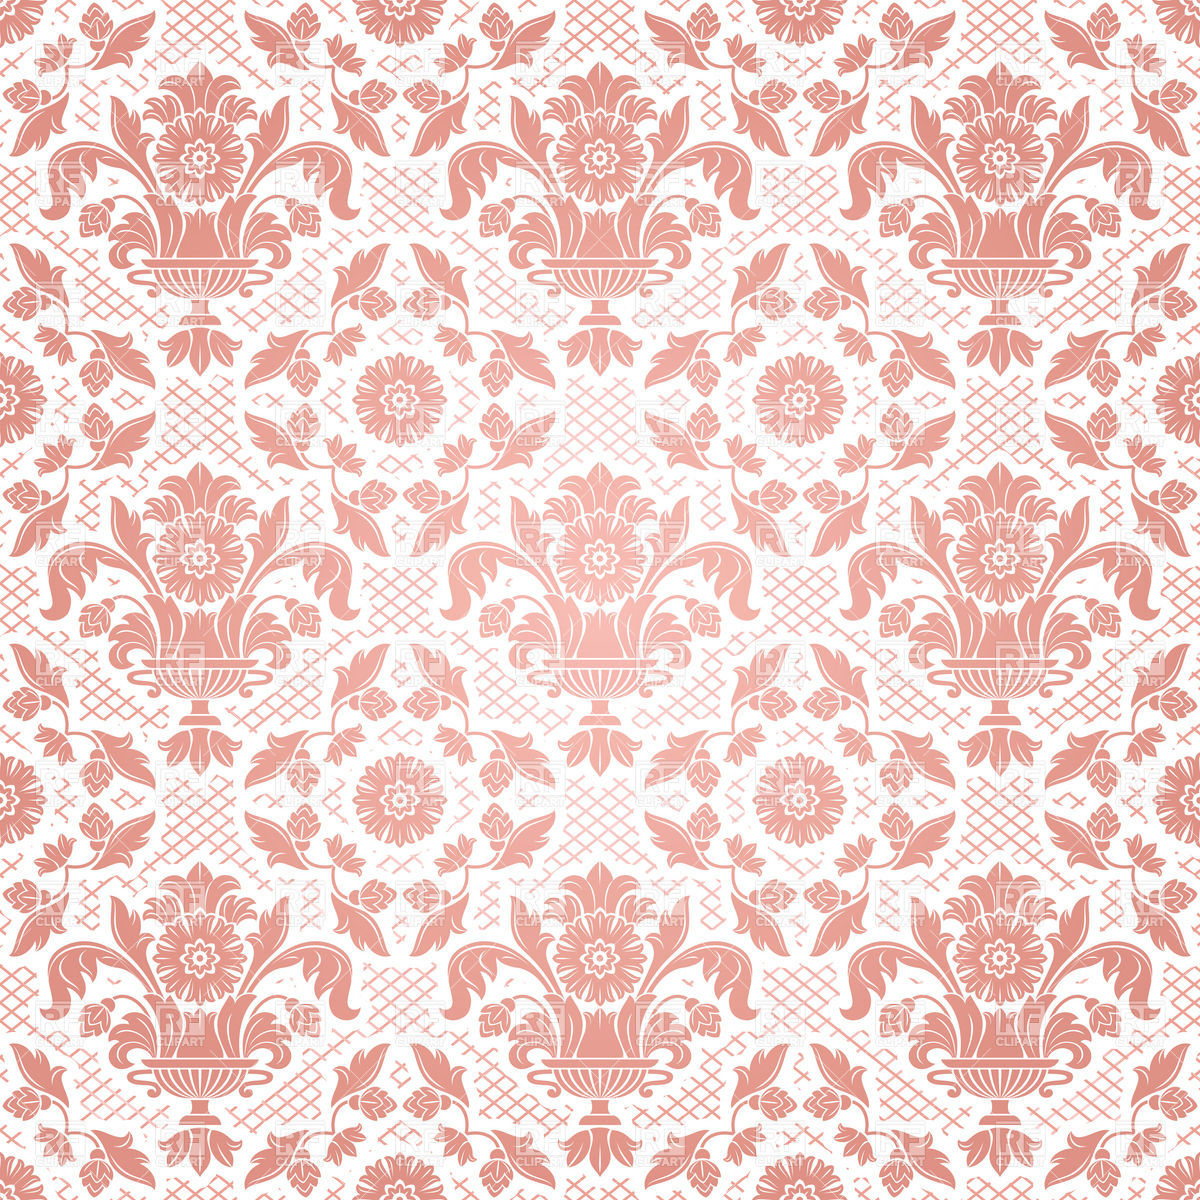 47+] Free Victorian Wallpaper Backgrounds on WallpaperSafari.